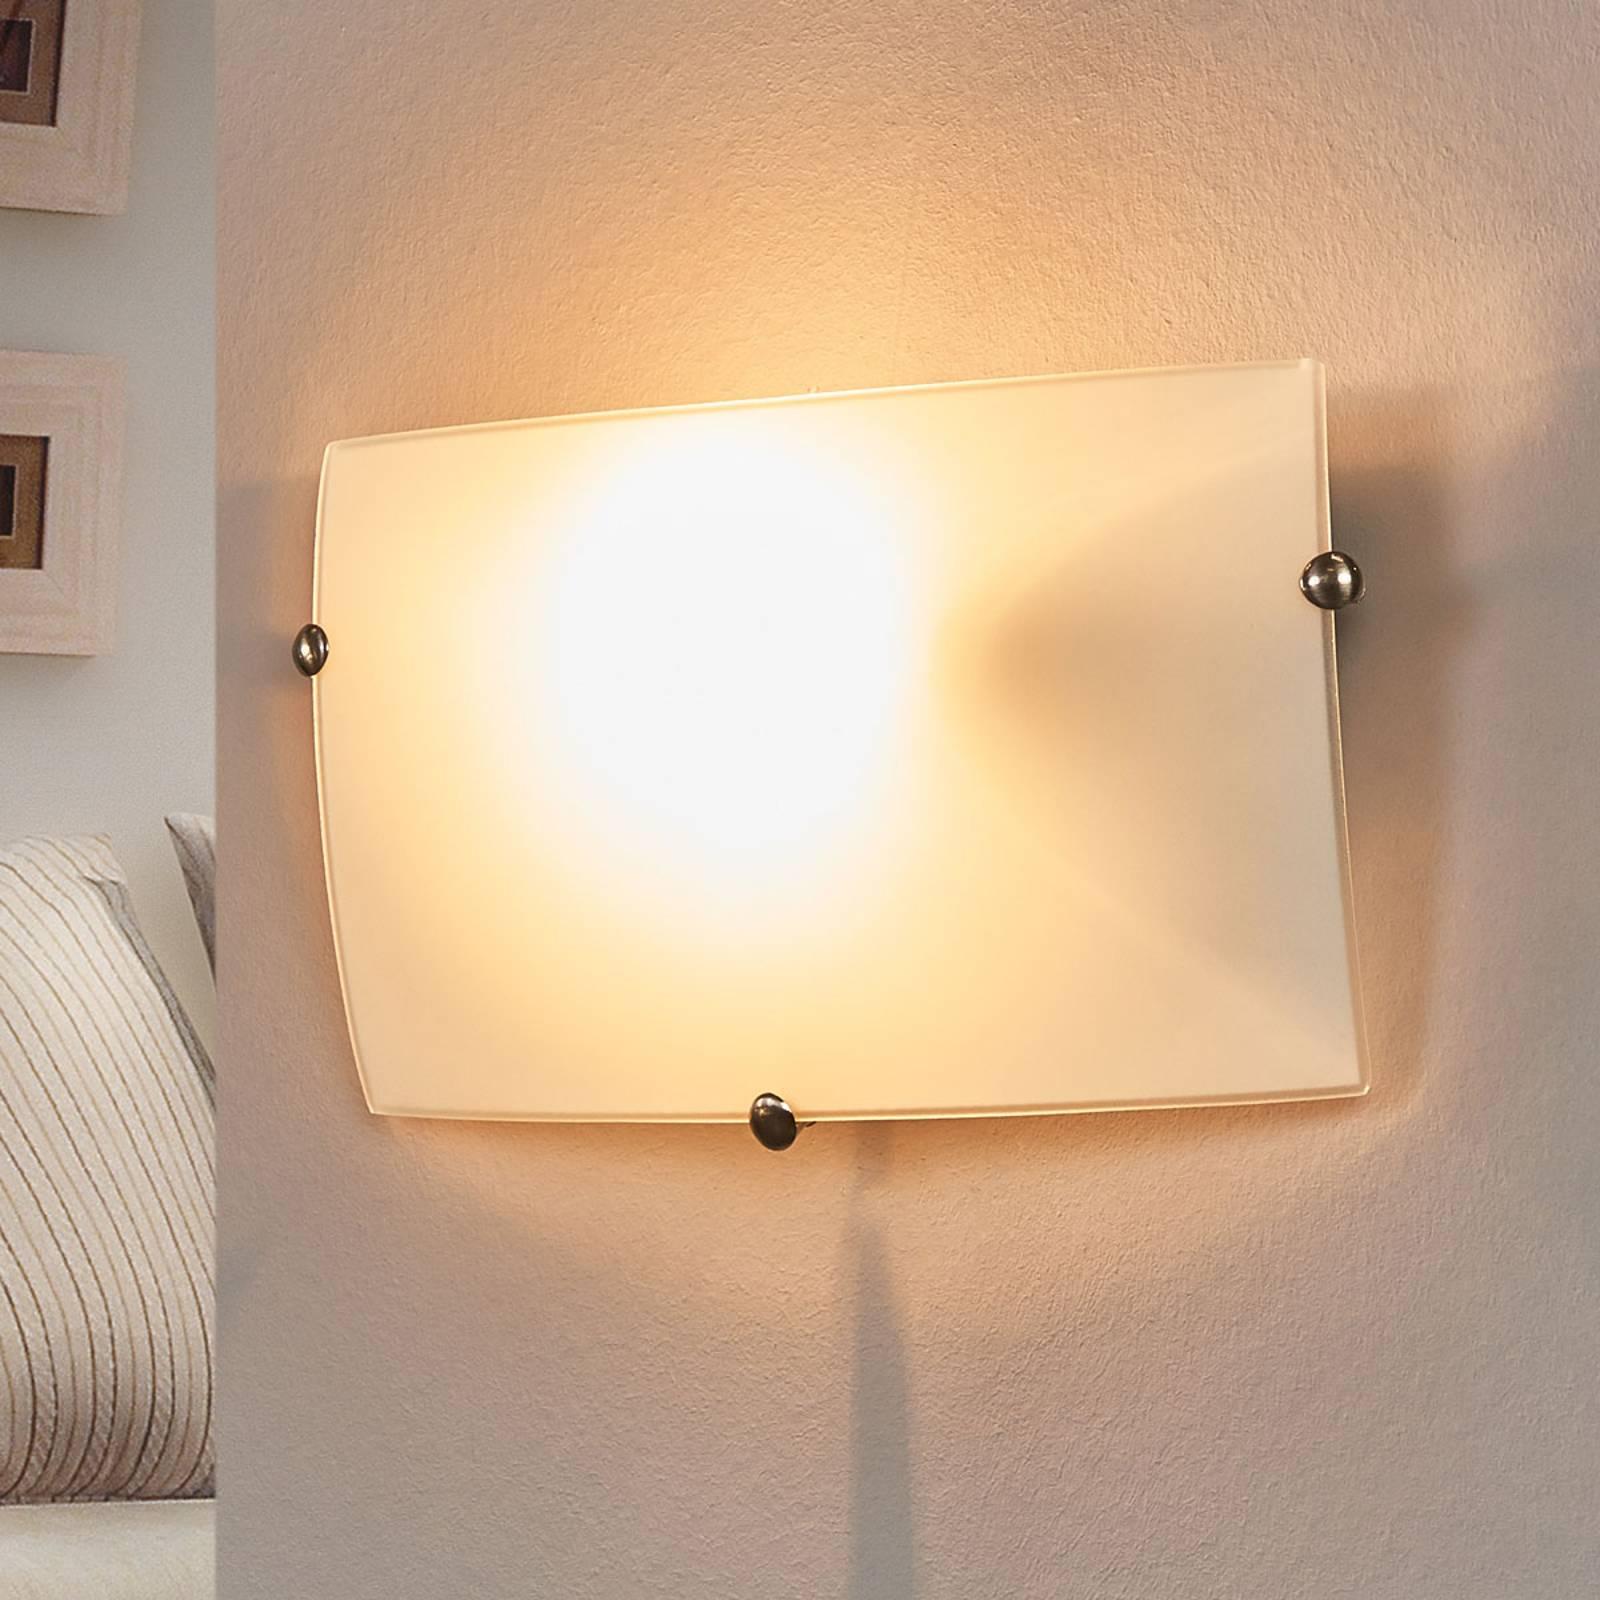 Bescheiden wandlamp Liria-1 van glas